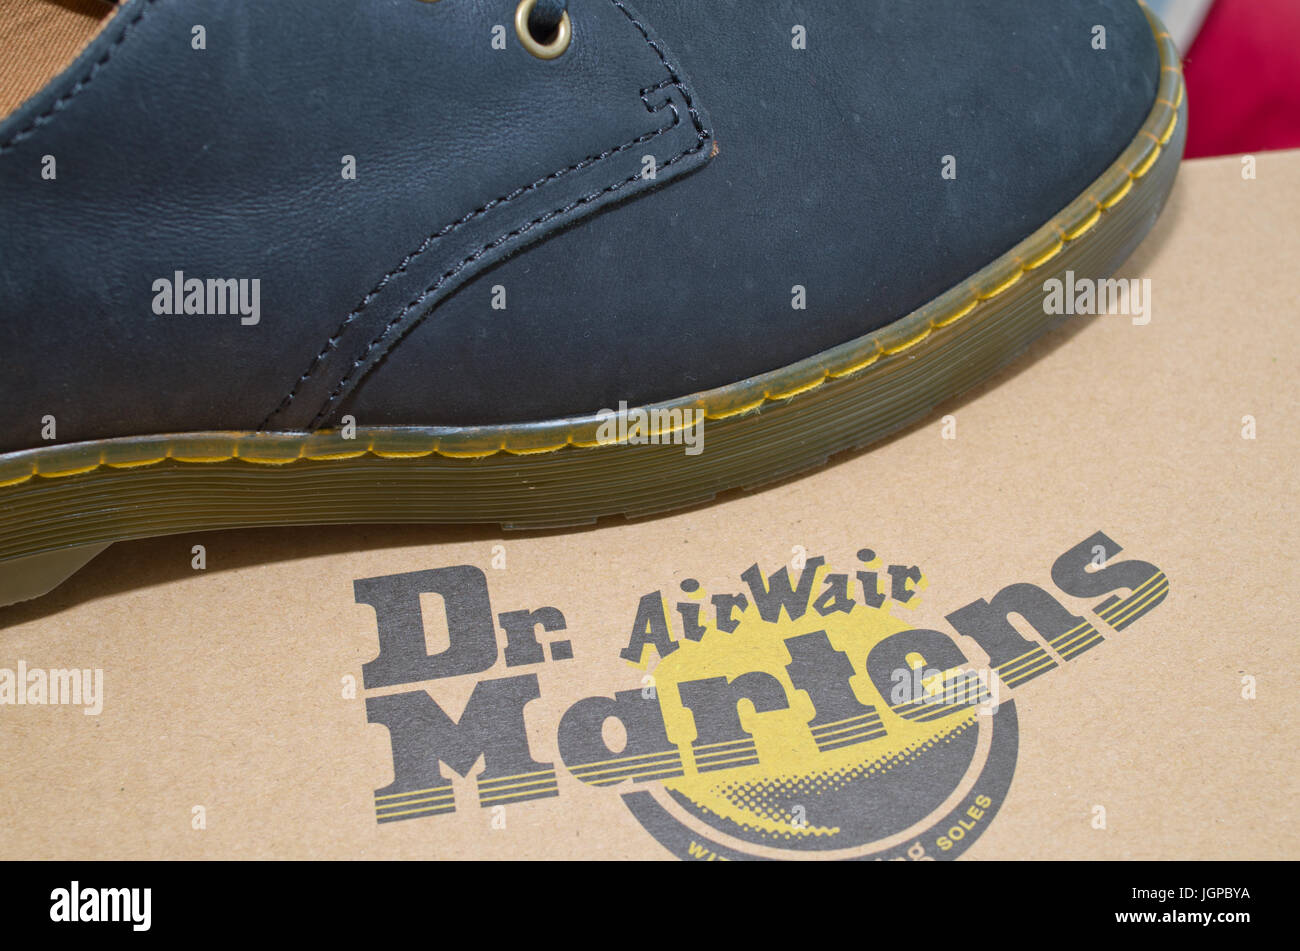 New Dr Martins Martin Shoe Shoes UK - Stock Image